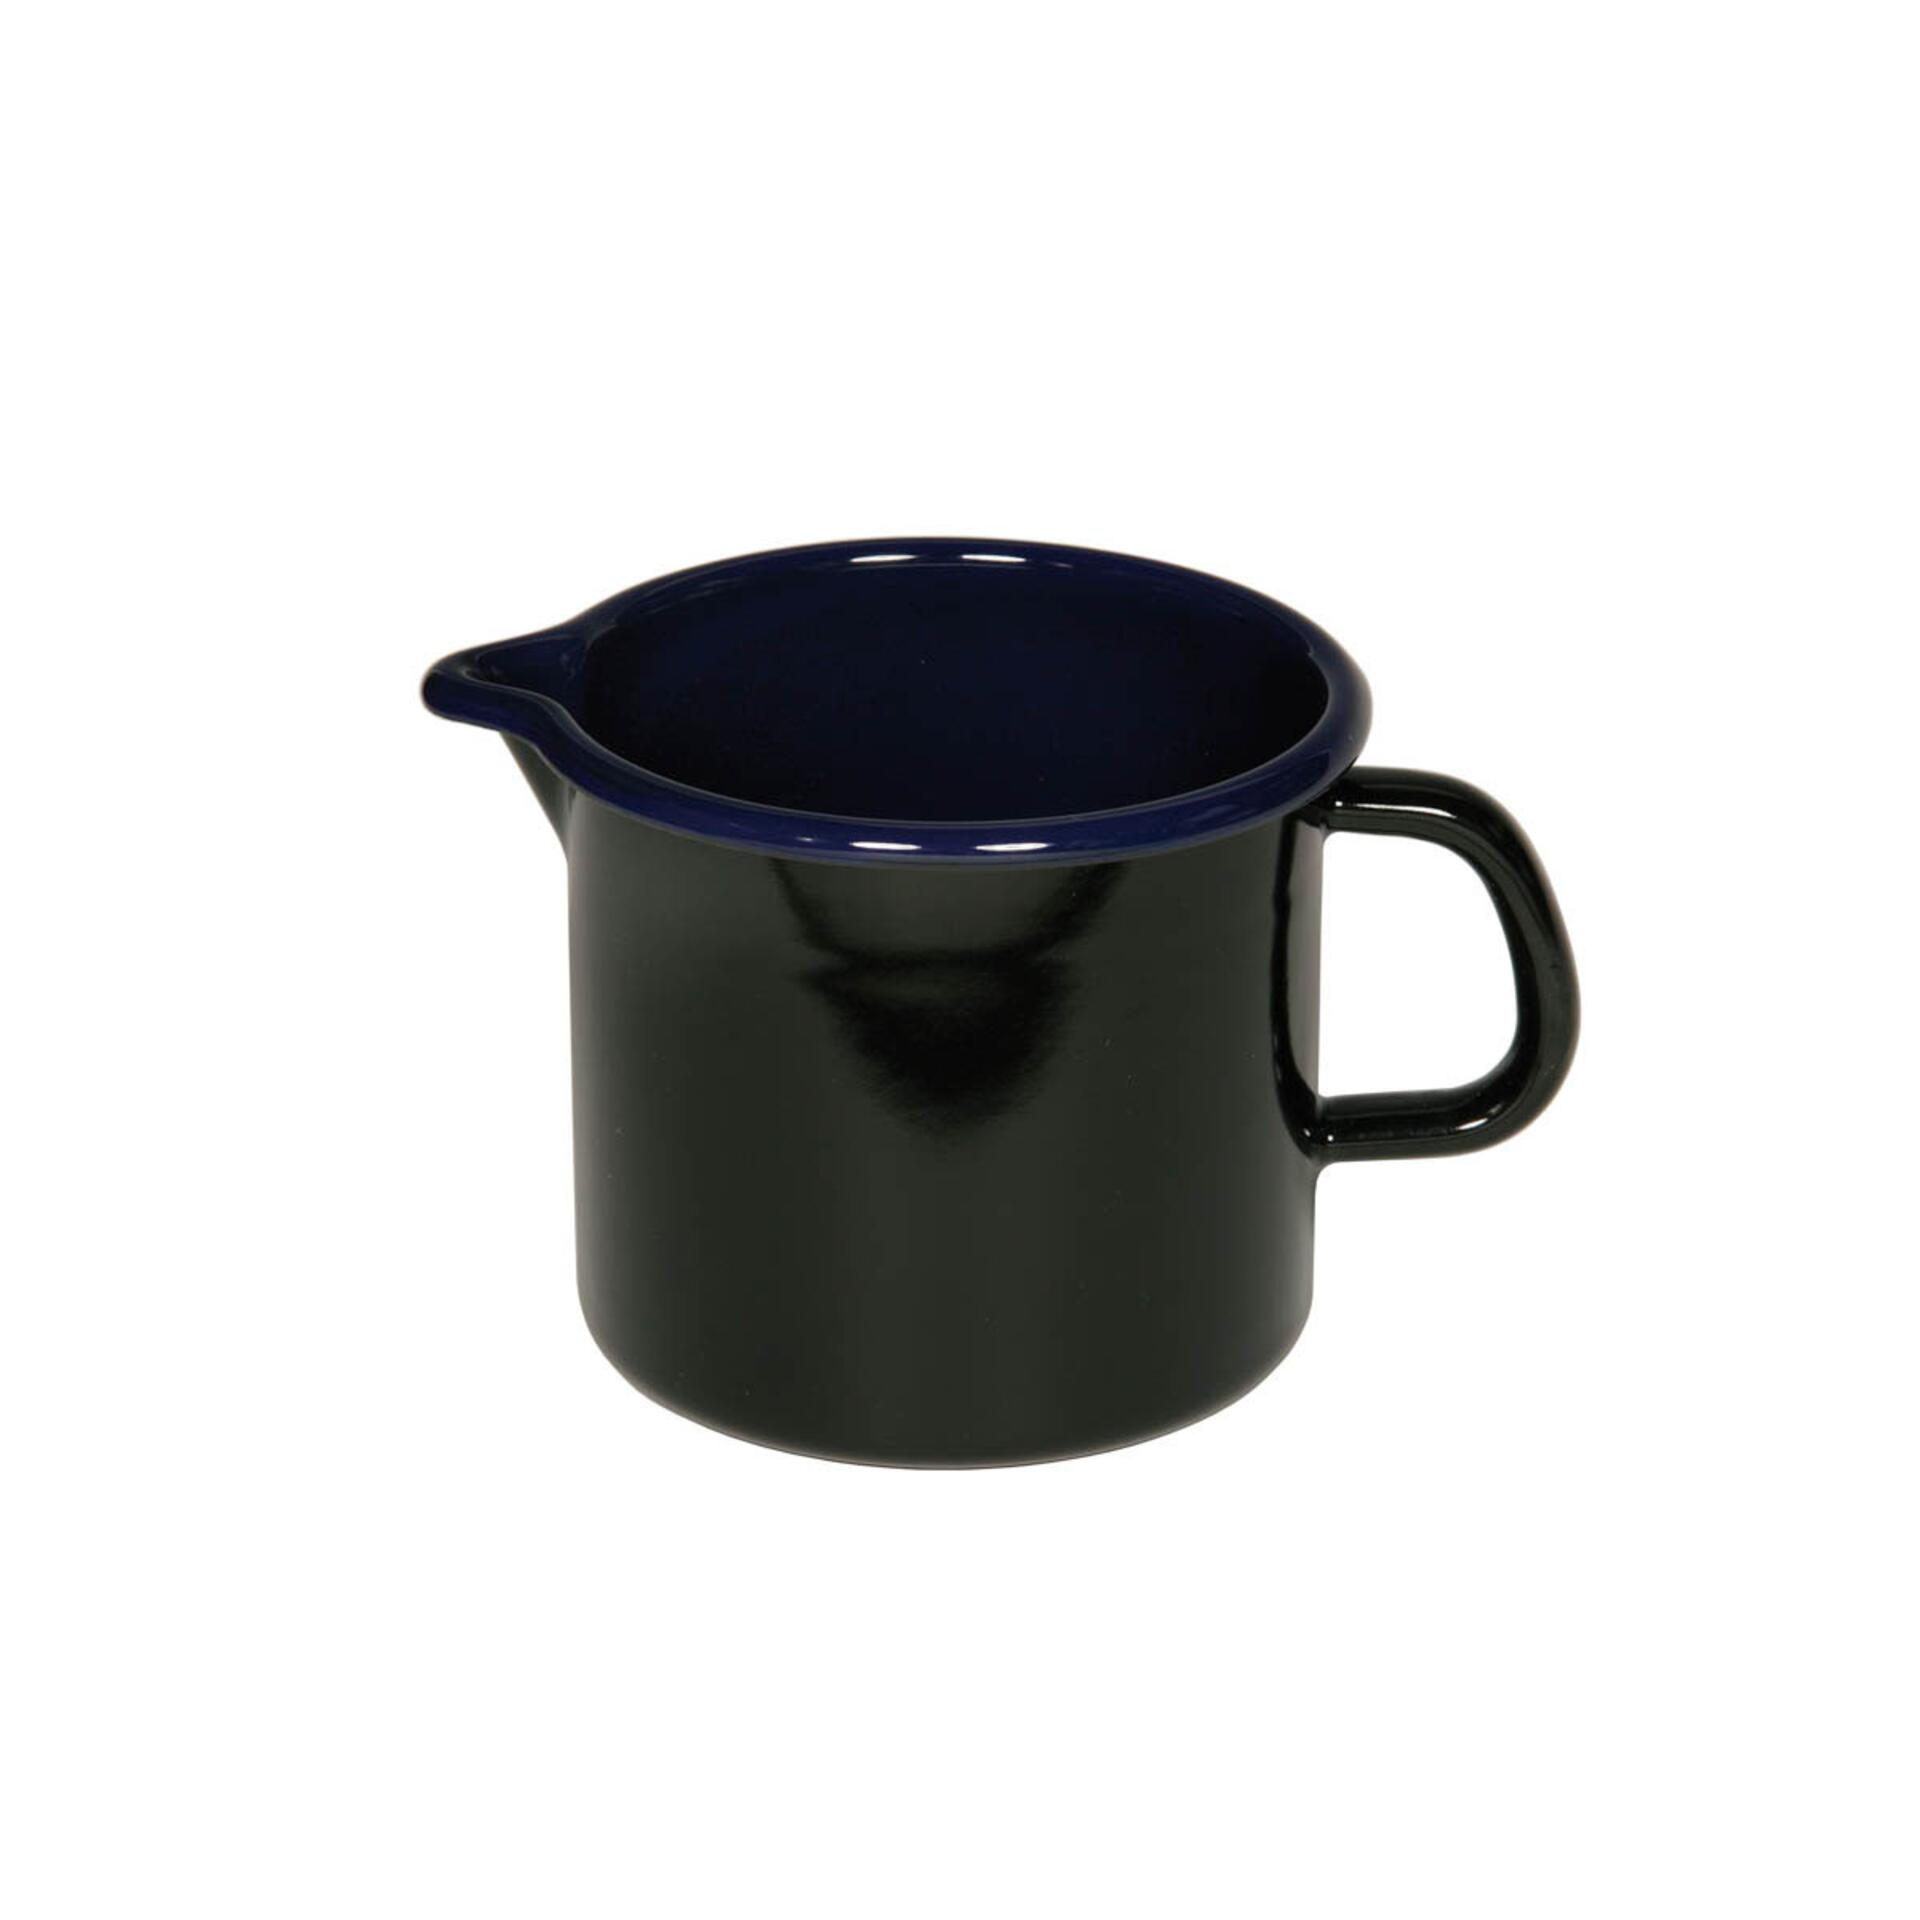 Riess Schnabeltopf 1,0 l Schwarz/blau